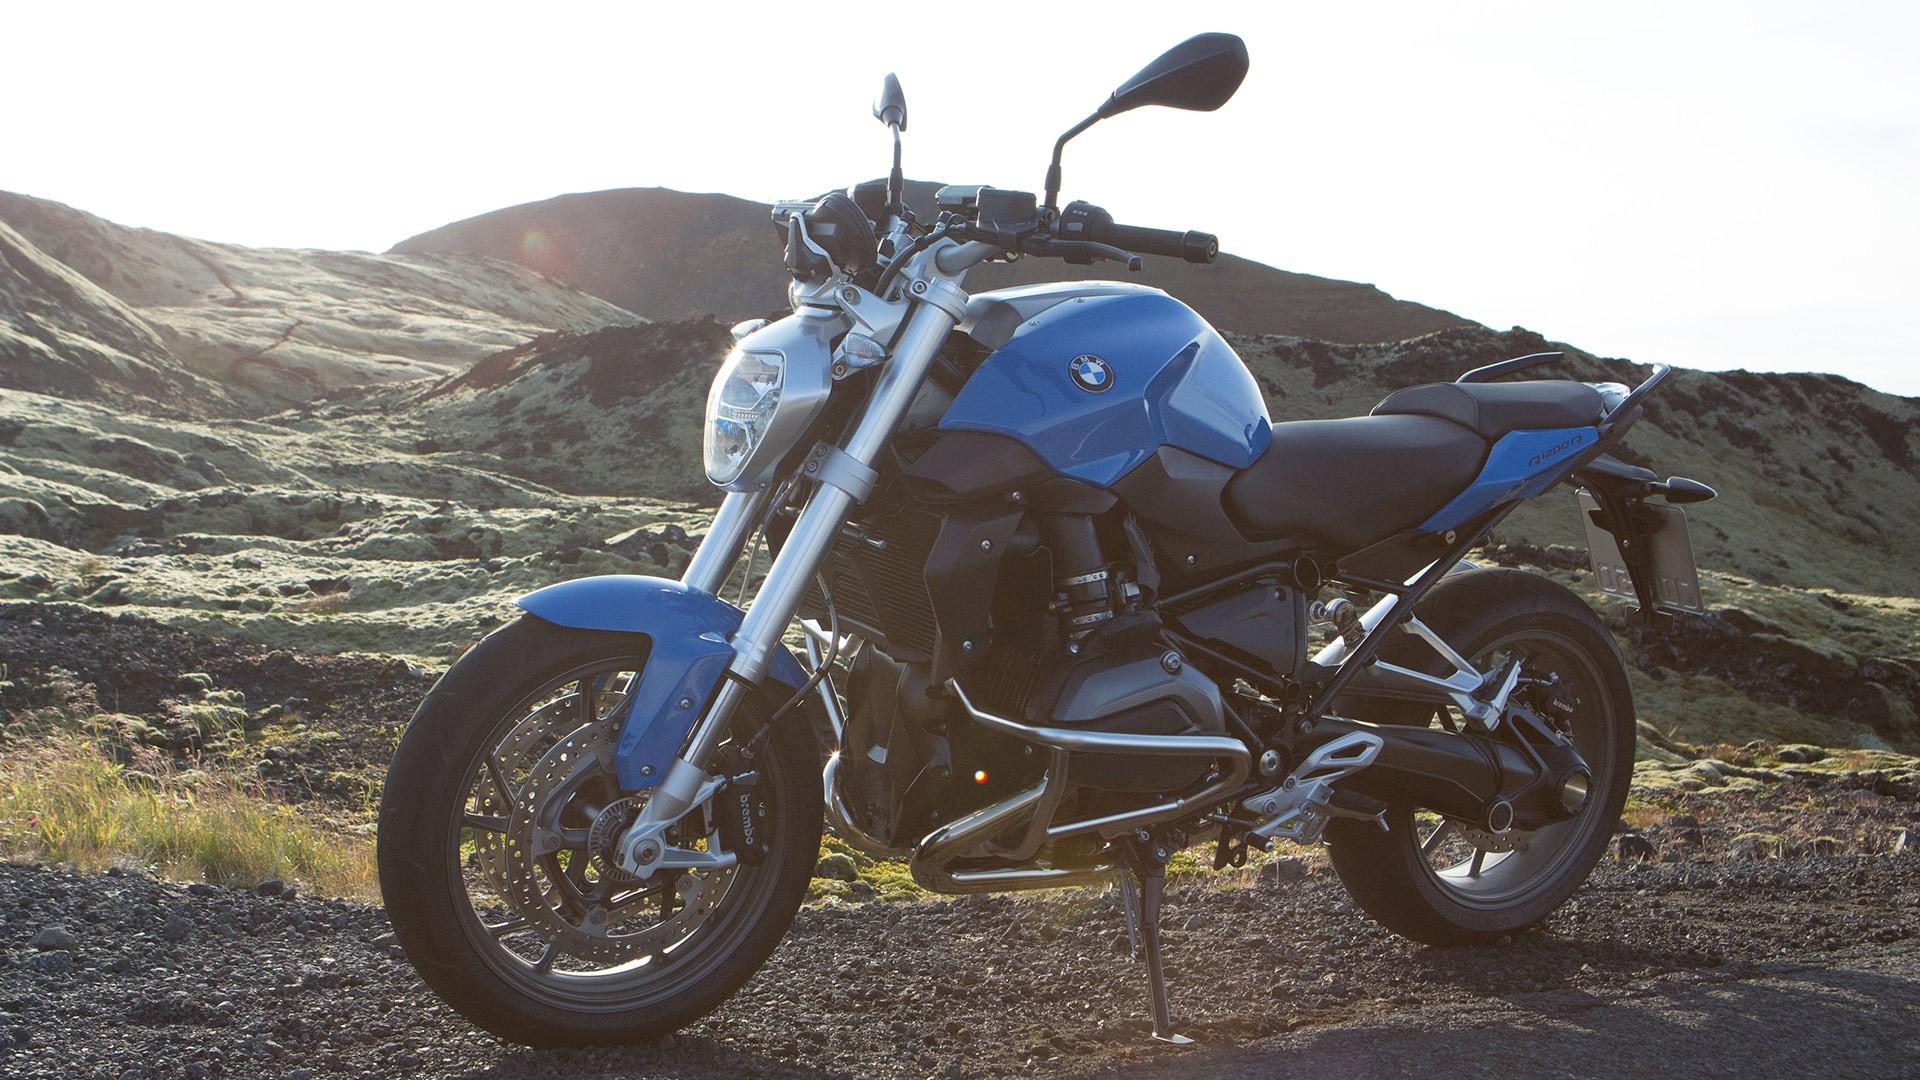 New Century BMW >> BMW R 1200 R specs - 2015, 2016 - autoevolution